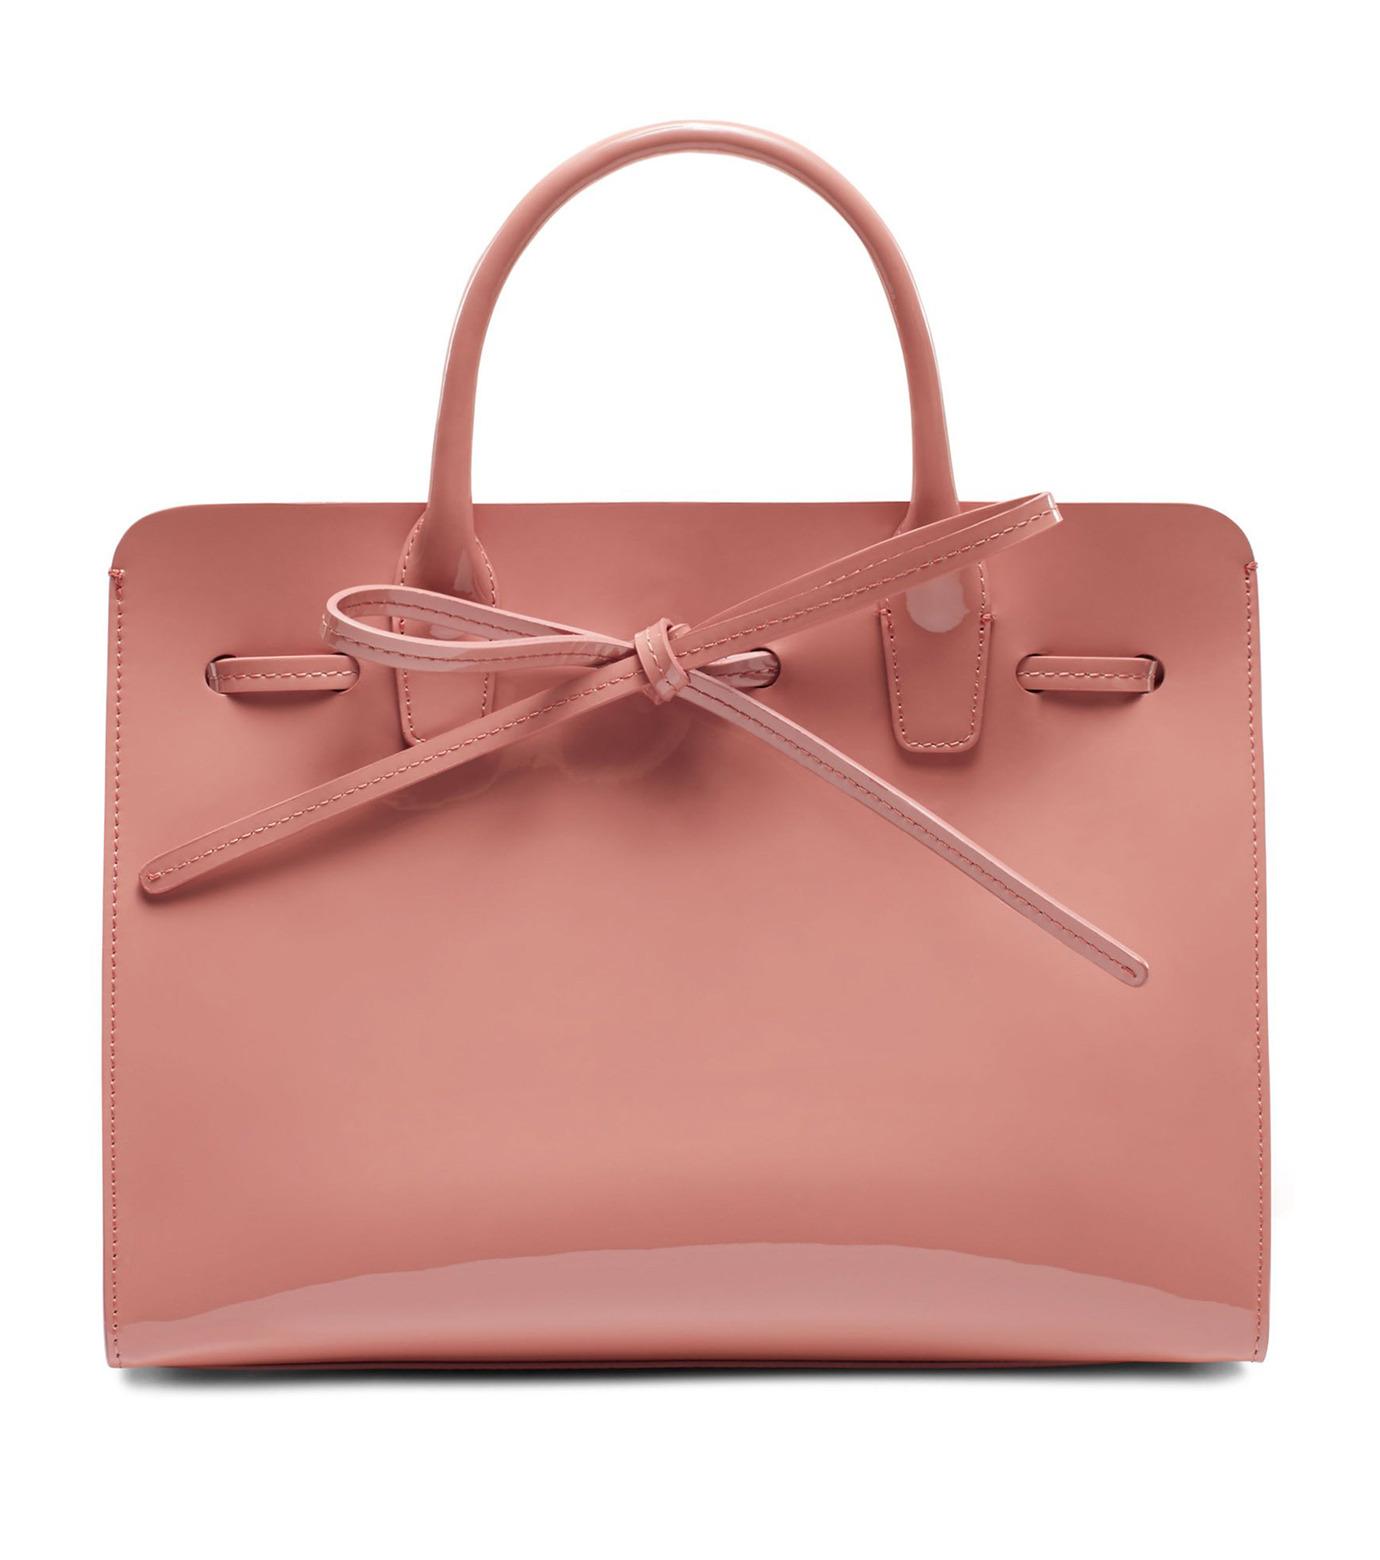 Mansur Gavriel(マンサーガブリエル)のpatent mini sun bag-LIGHT PINK(ハンドバッグ/hand bag)-HMS030PA-71 拡大詳細画像1